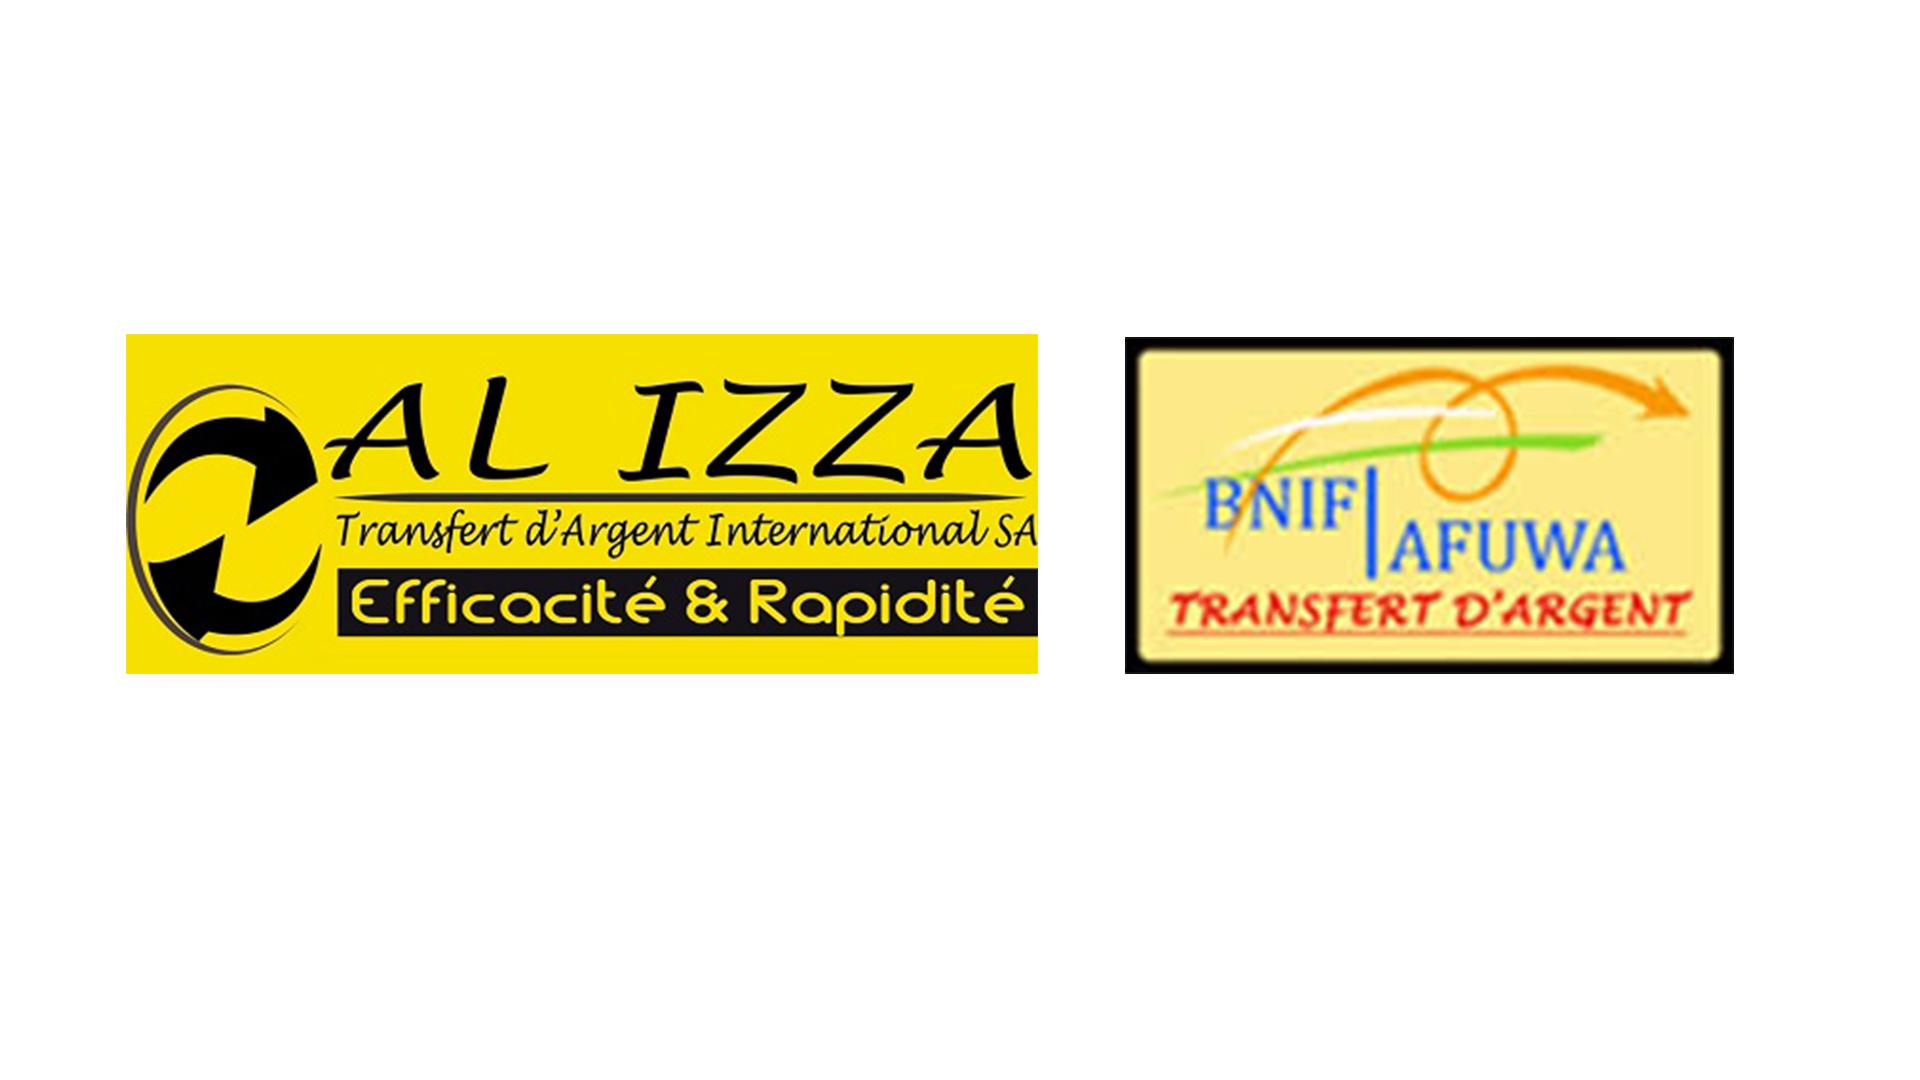 AL IZZA et BNIF AFWUA deviennent des établissements financiers